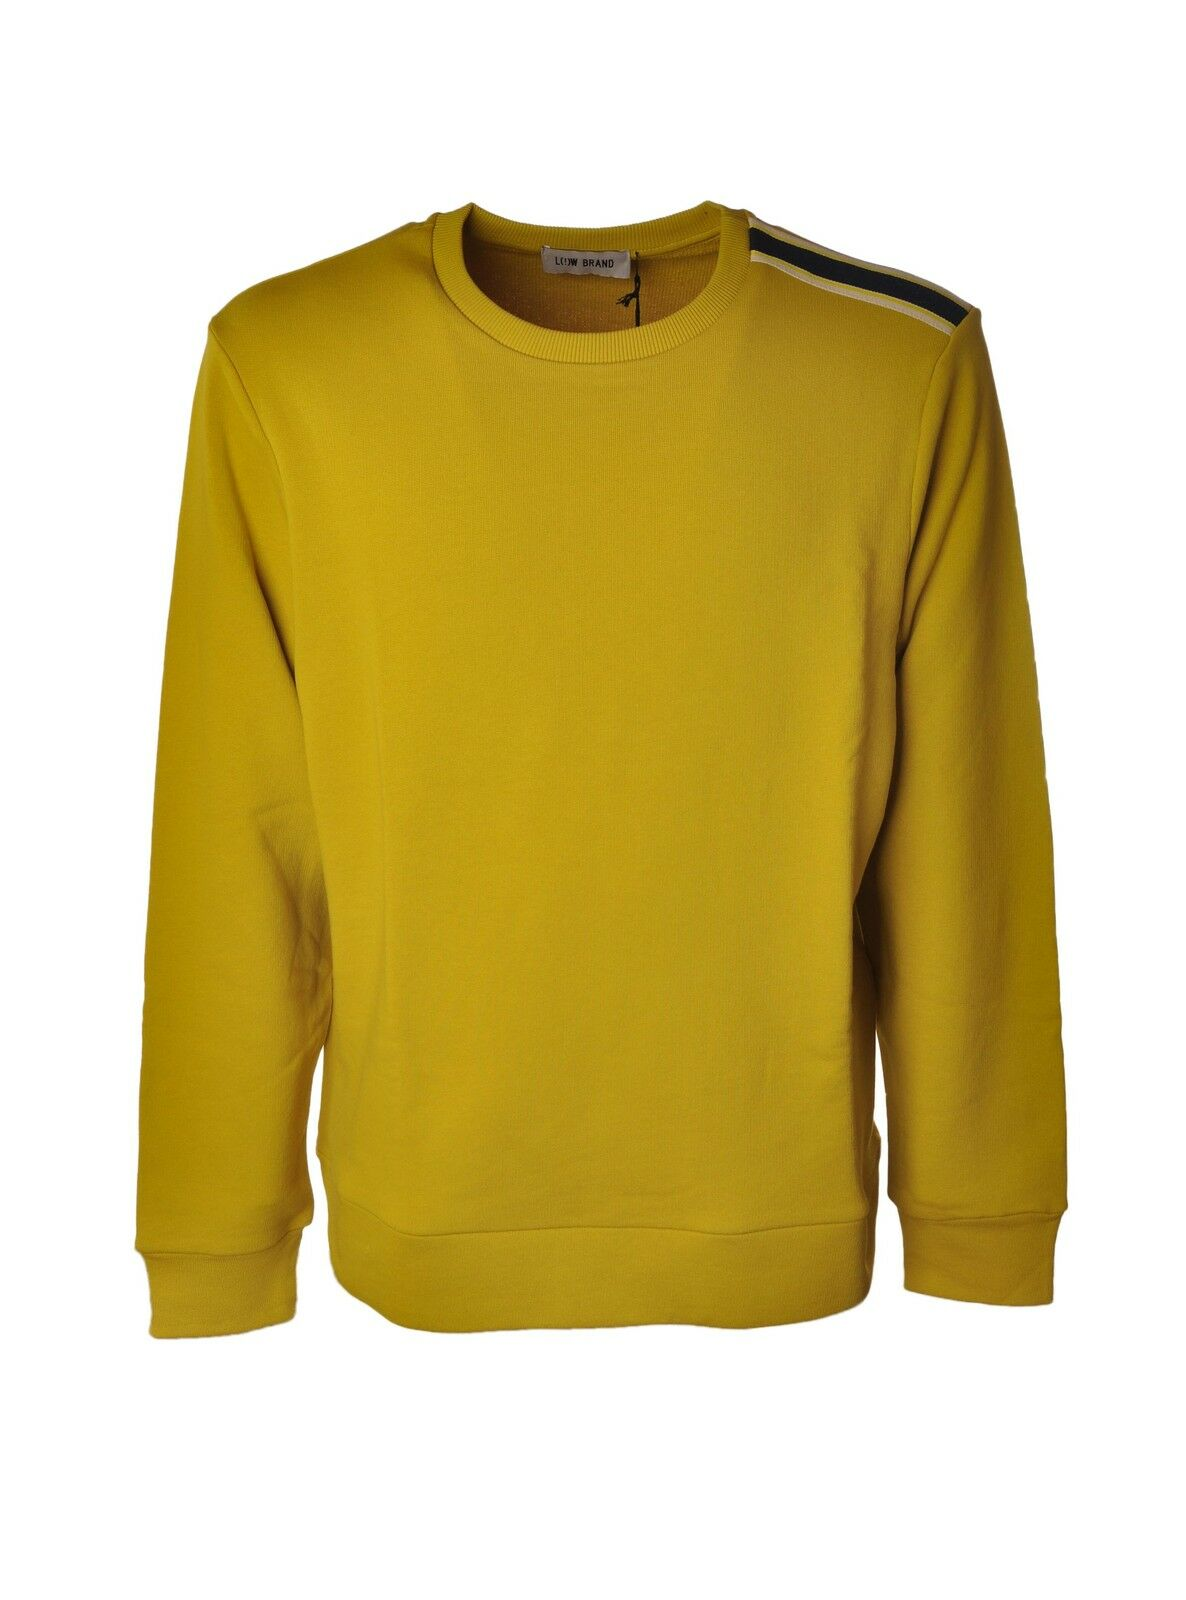 Low Brand  -  Sweatshirts - Male - Yellow - 3831429A184751